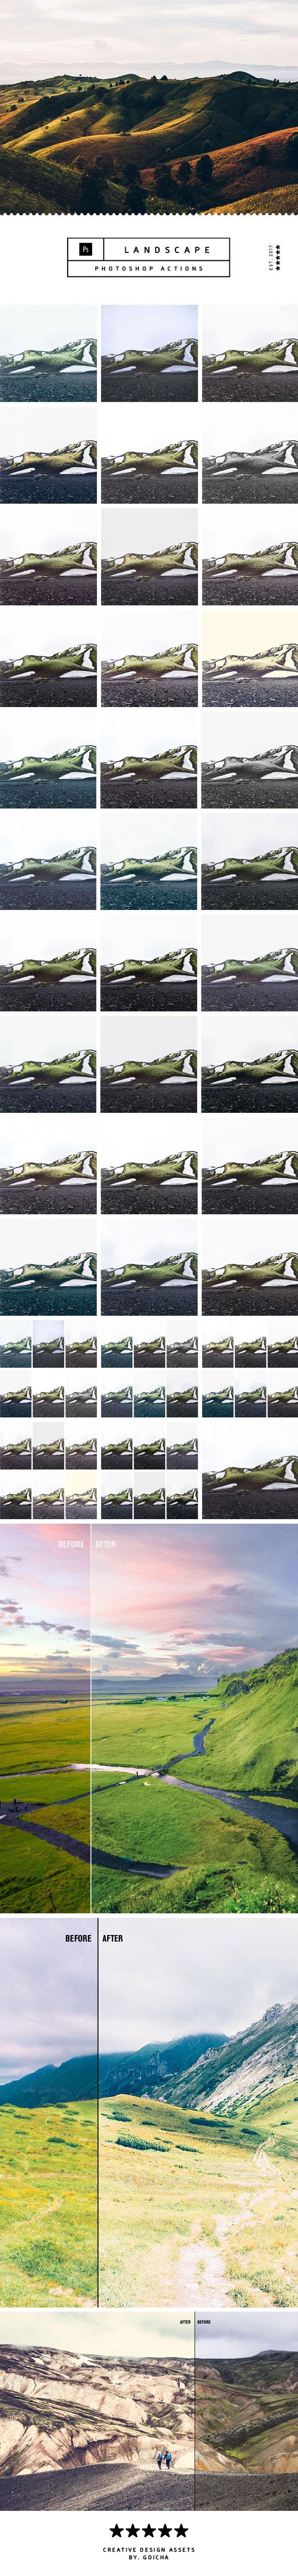 Landscape Photoshop Actions - Photo Effects Actions